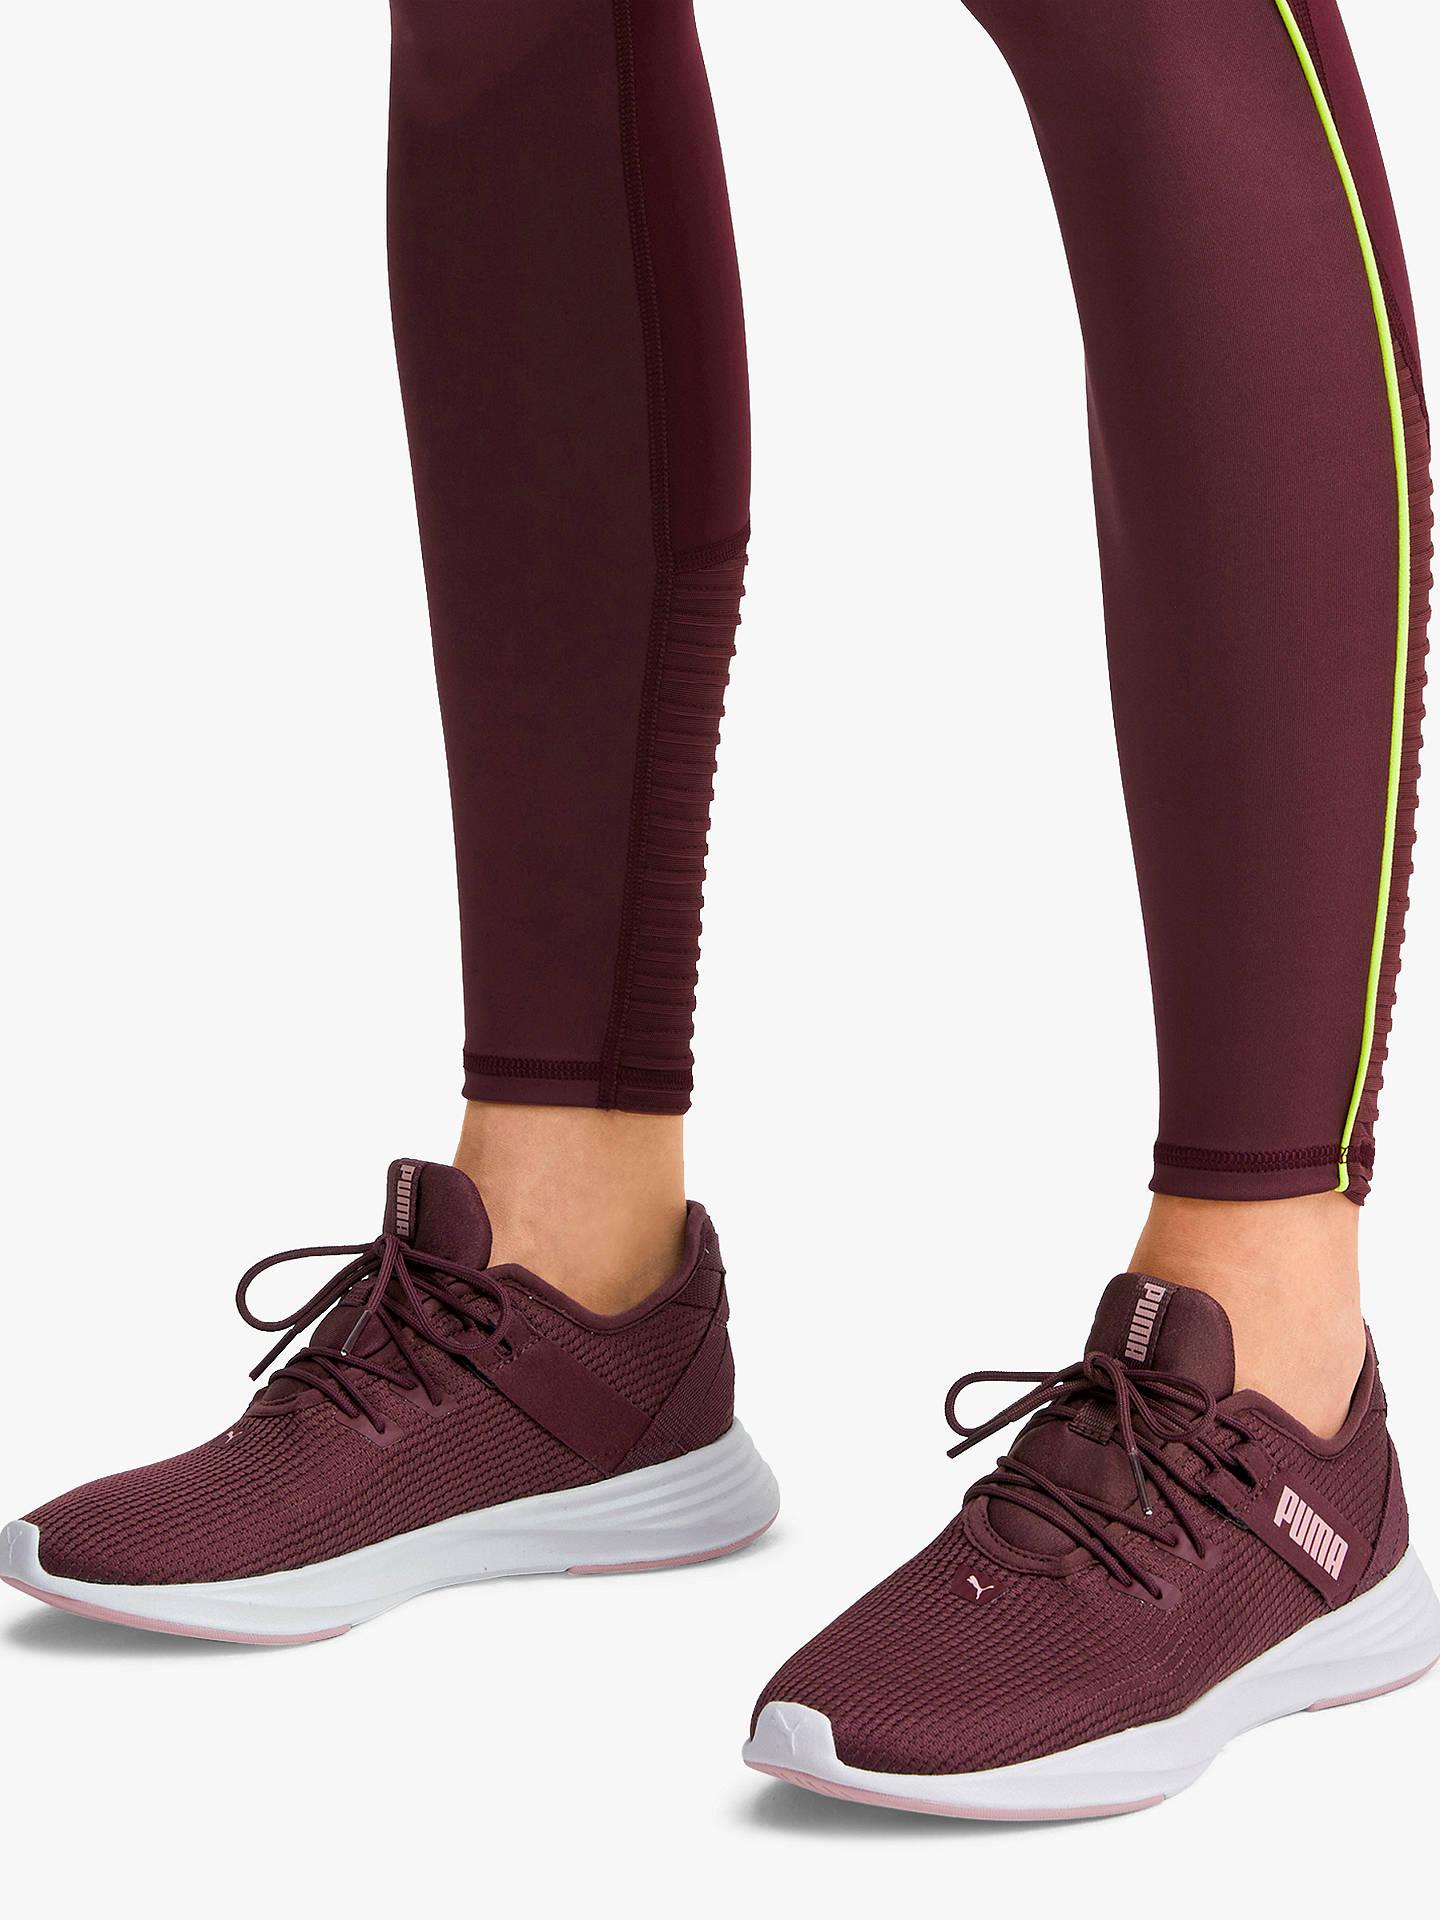 PUMA Women`s Radiate XT Trainers, Size UK 3.5, Puma White